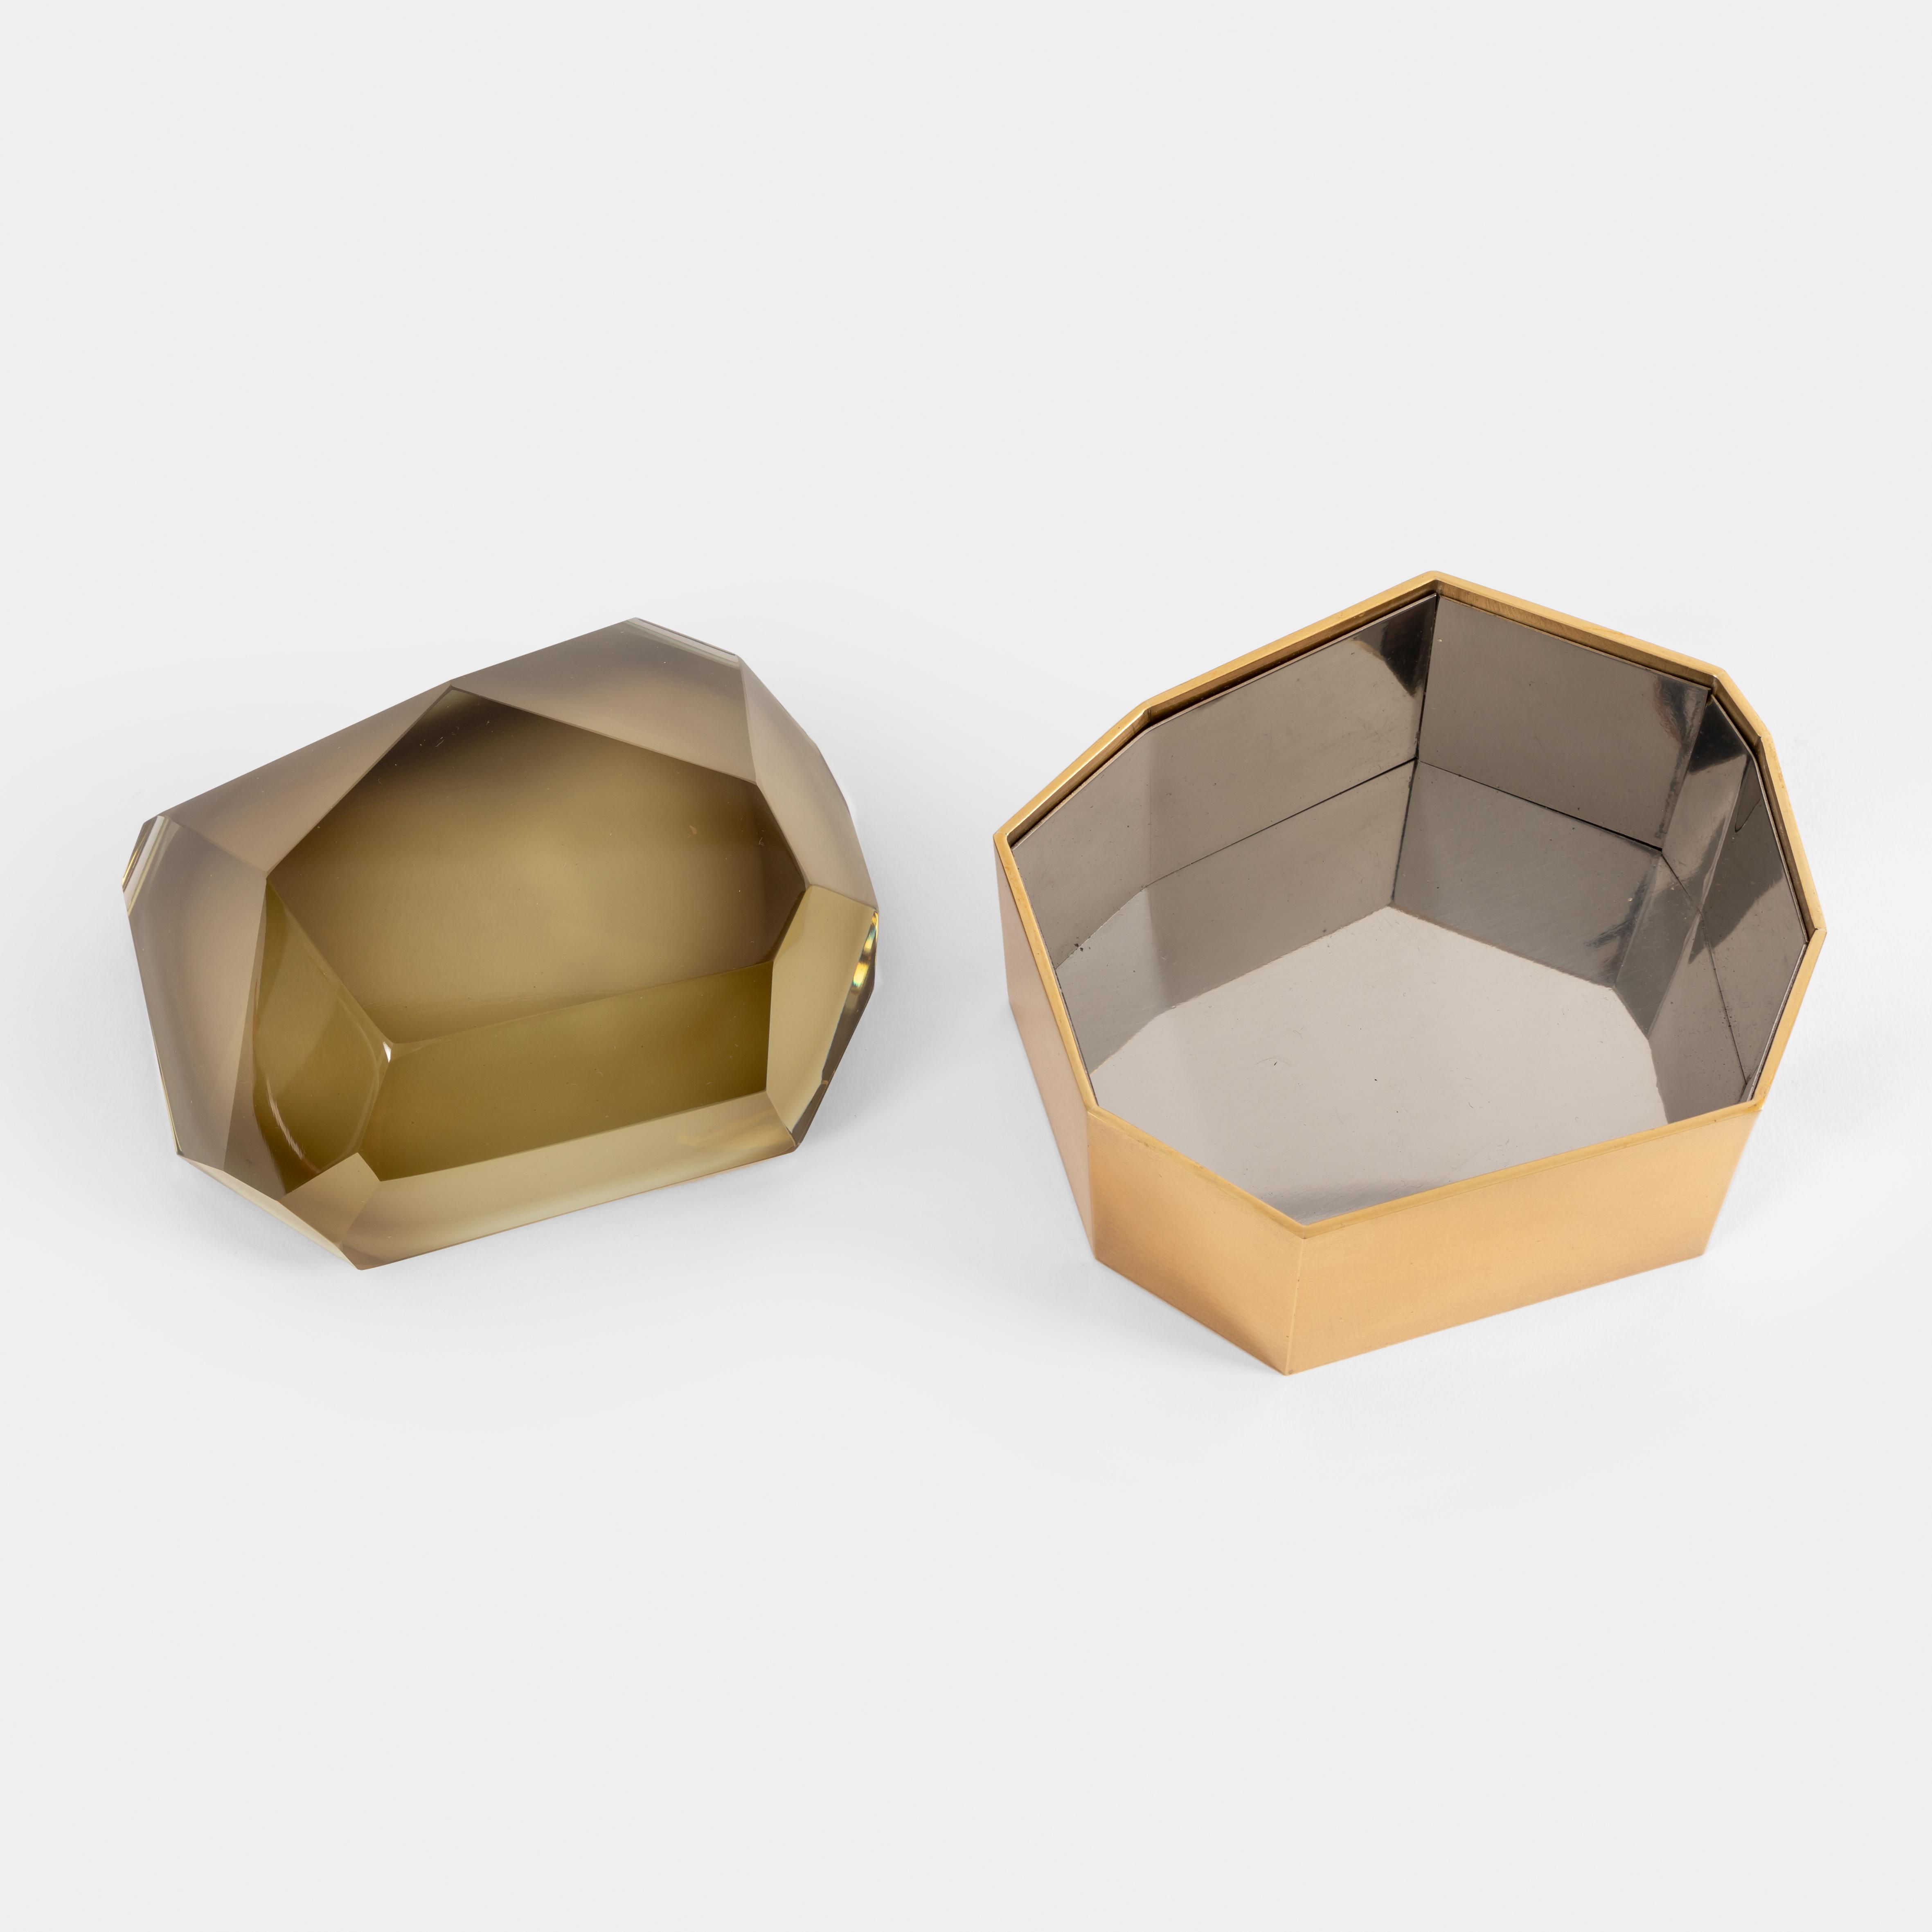 Smokey 'Diamante Murano' Glass Box by Roberto Giulio Rida | soyun k.